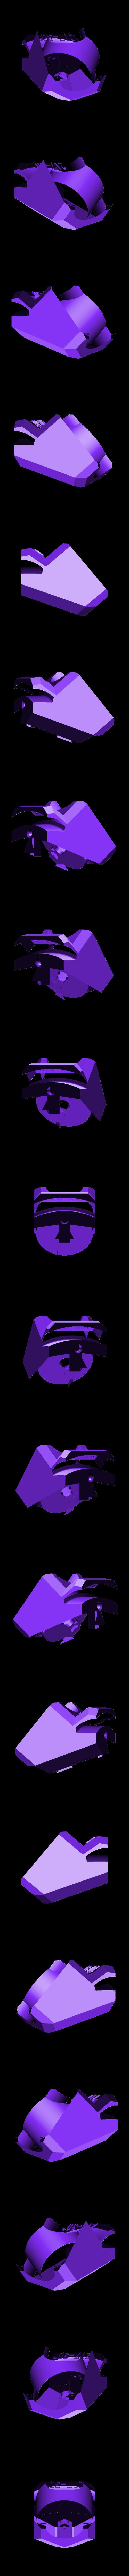 217_30dg_d32mm_top_body.stl Download free STL file PISTOL VR magnetic gunstock Oculus Rift-S Quest • 3D printer template, danielschweinert